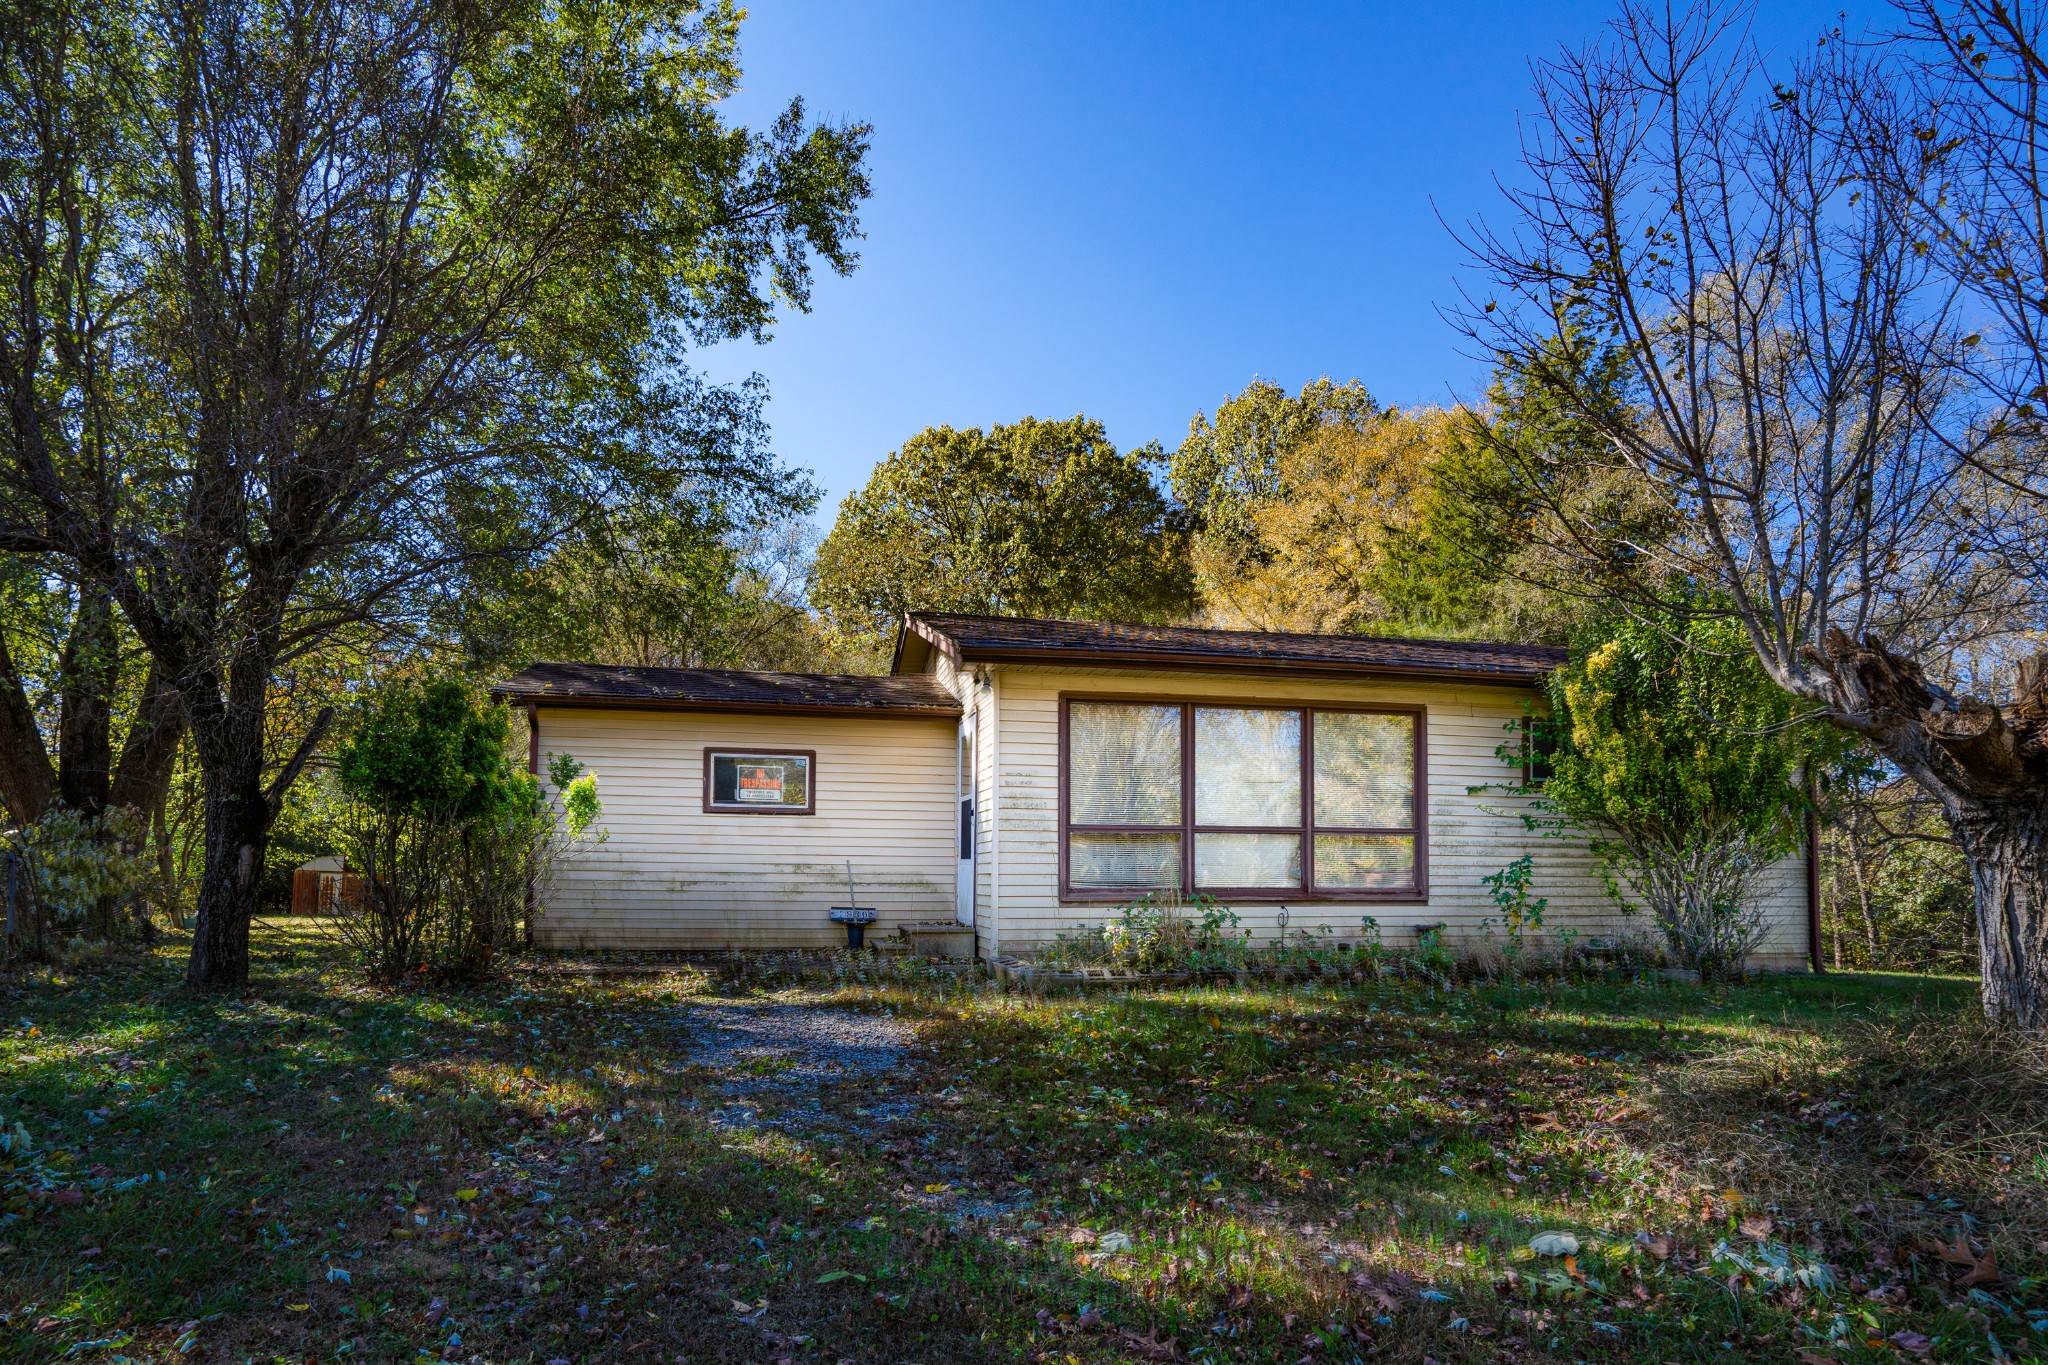 830 Potters Ln, Clarksville, TN 37040 - Clarksville, TN real estate listing